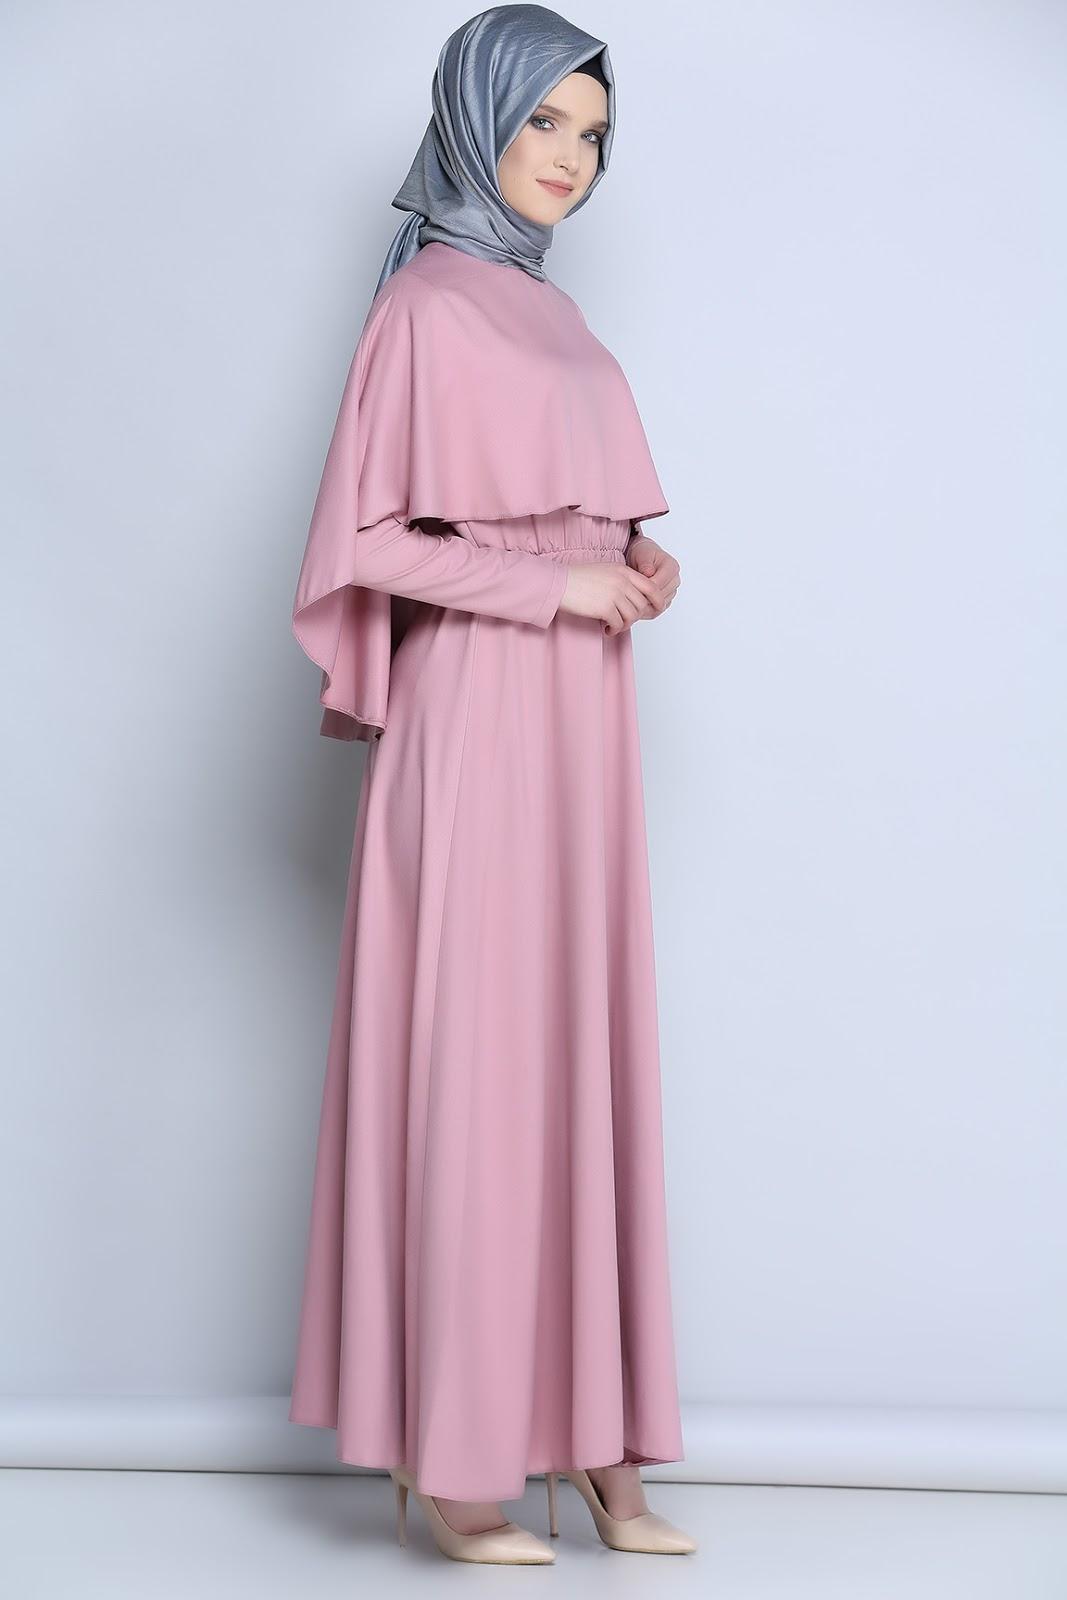 Style Hijab 2018 Fashion